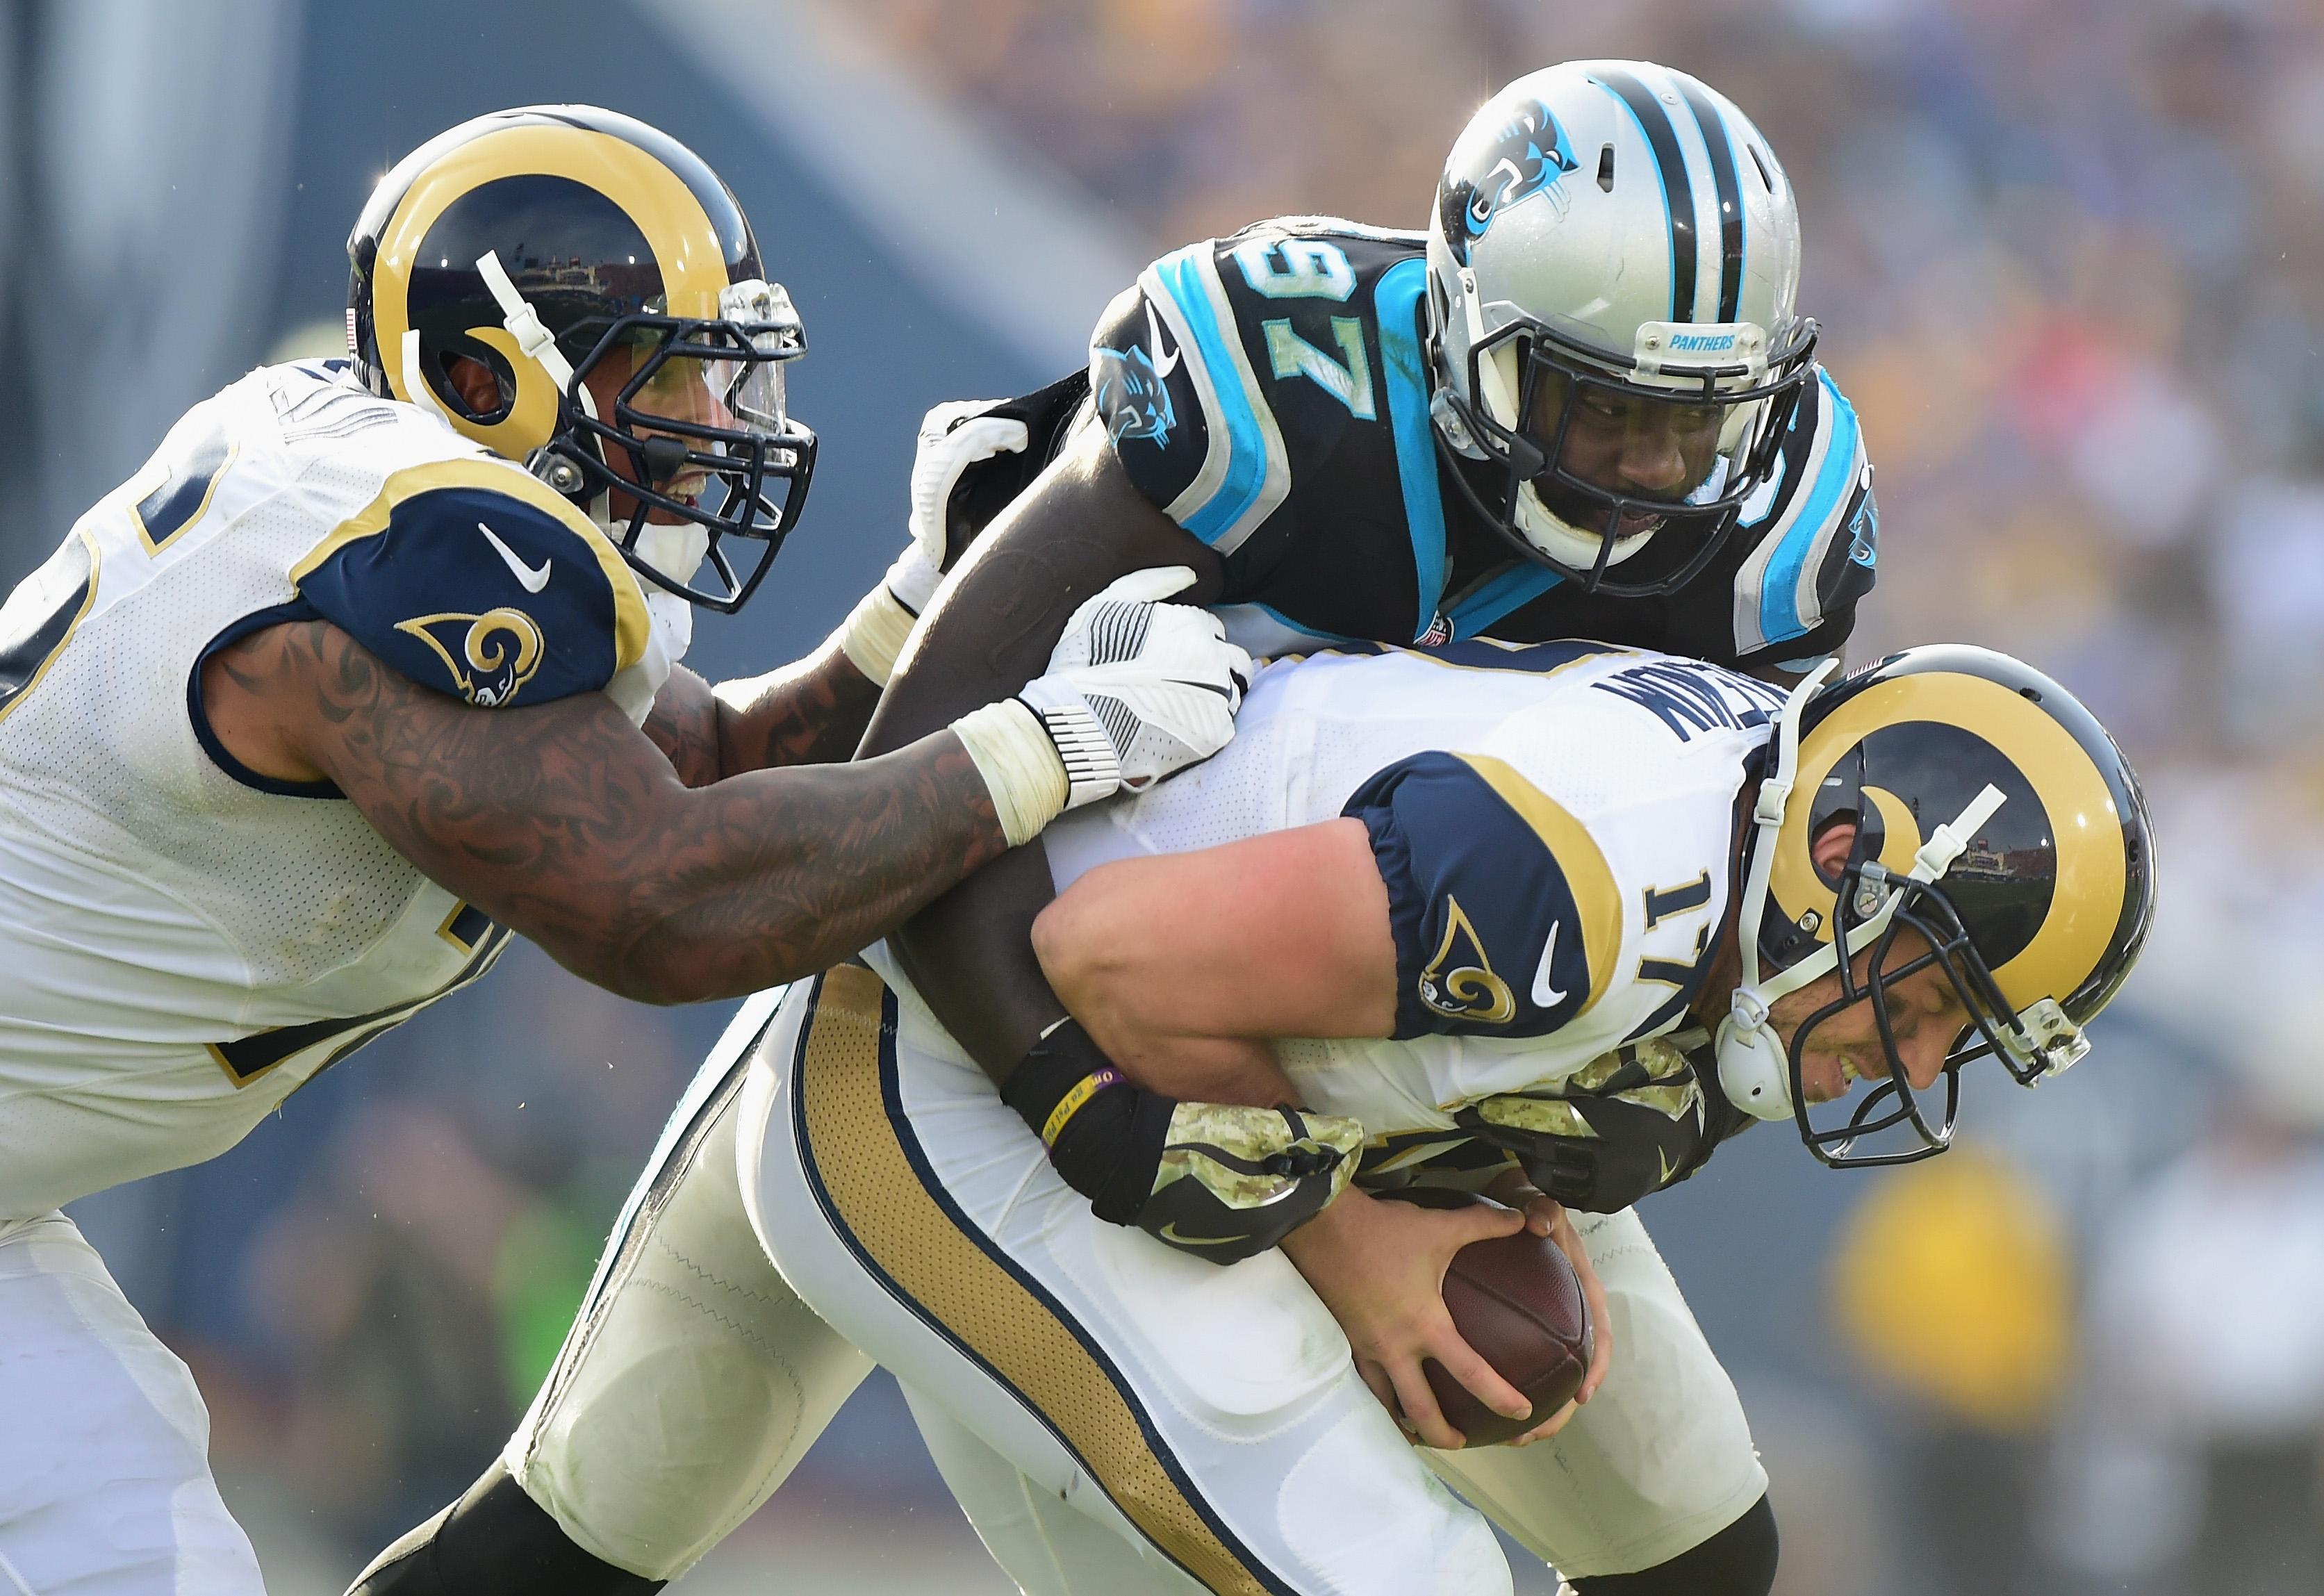 Carolina Panthers Roster Analysis: Mario Addison, DE